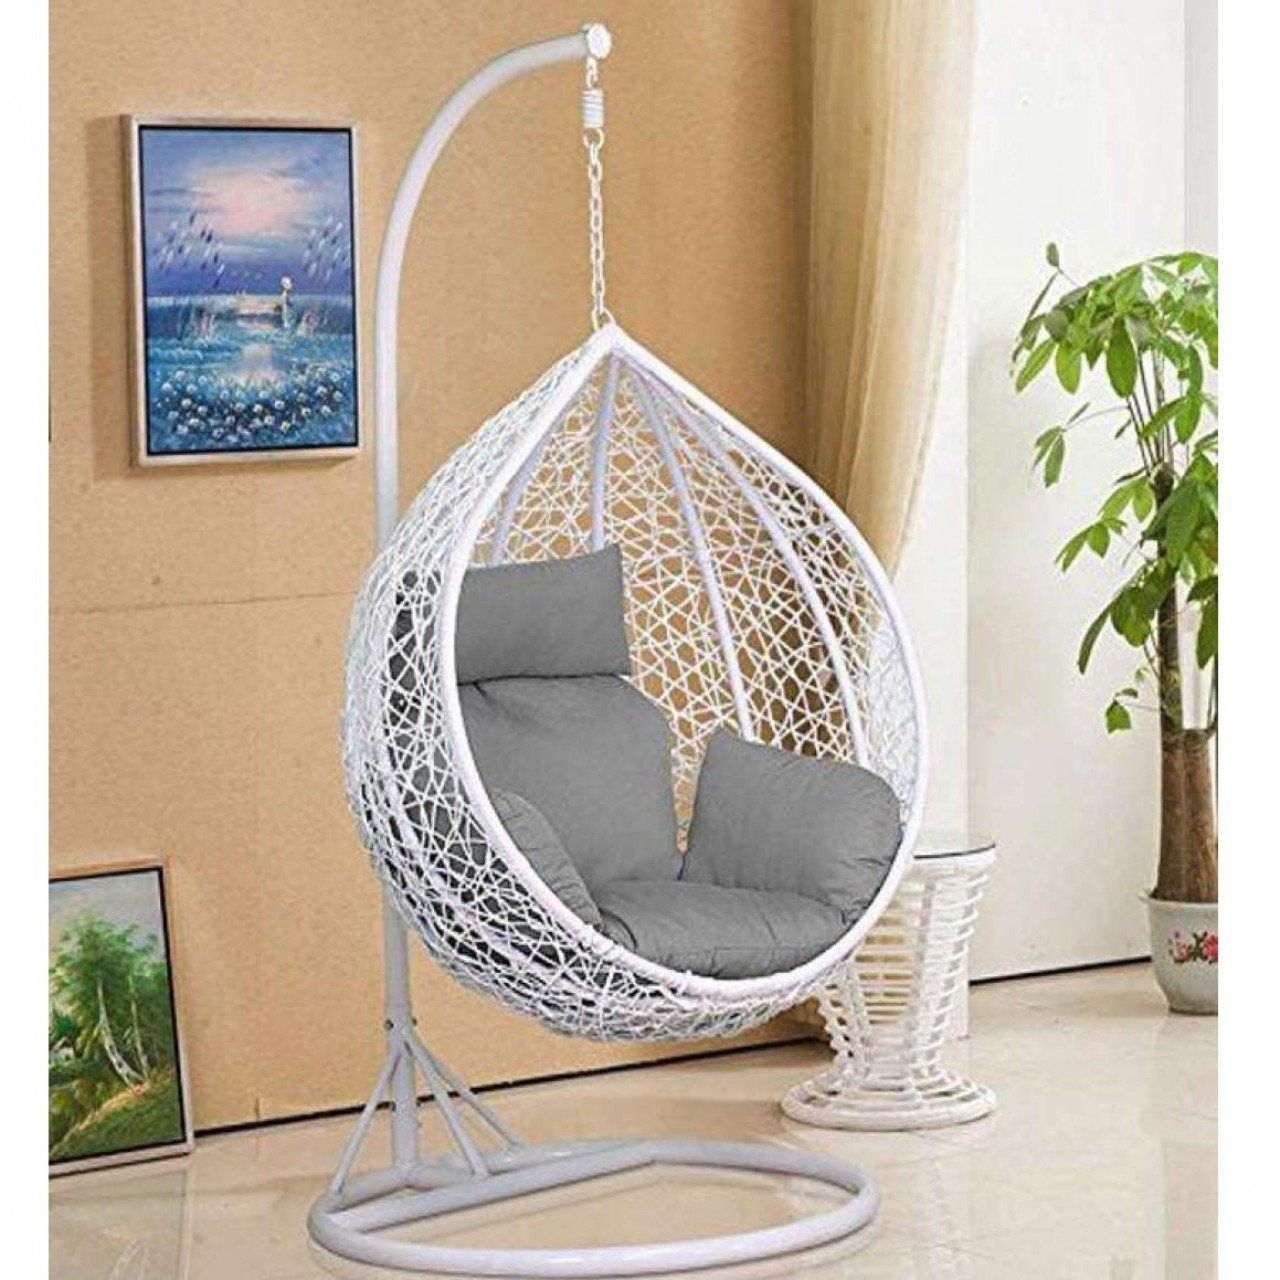 BUY Egg Shape Swing in 2020 Swing chair for bedroom